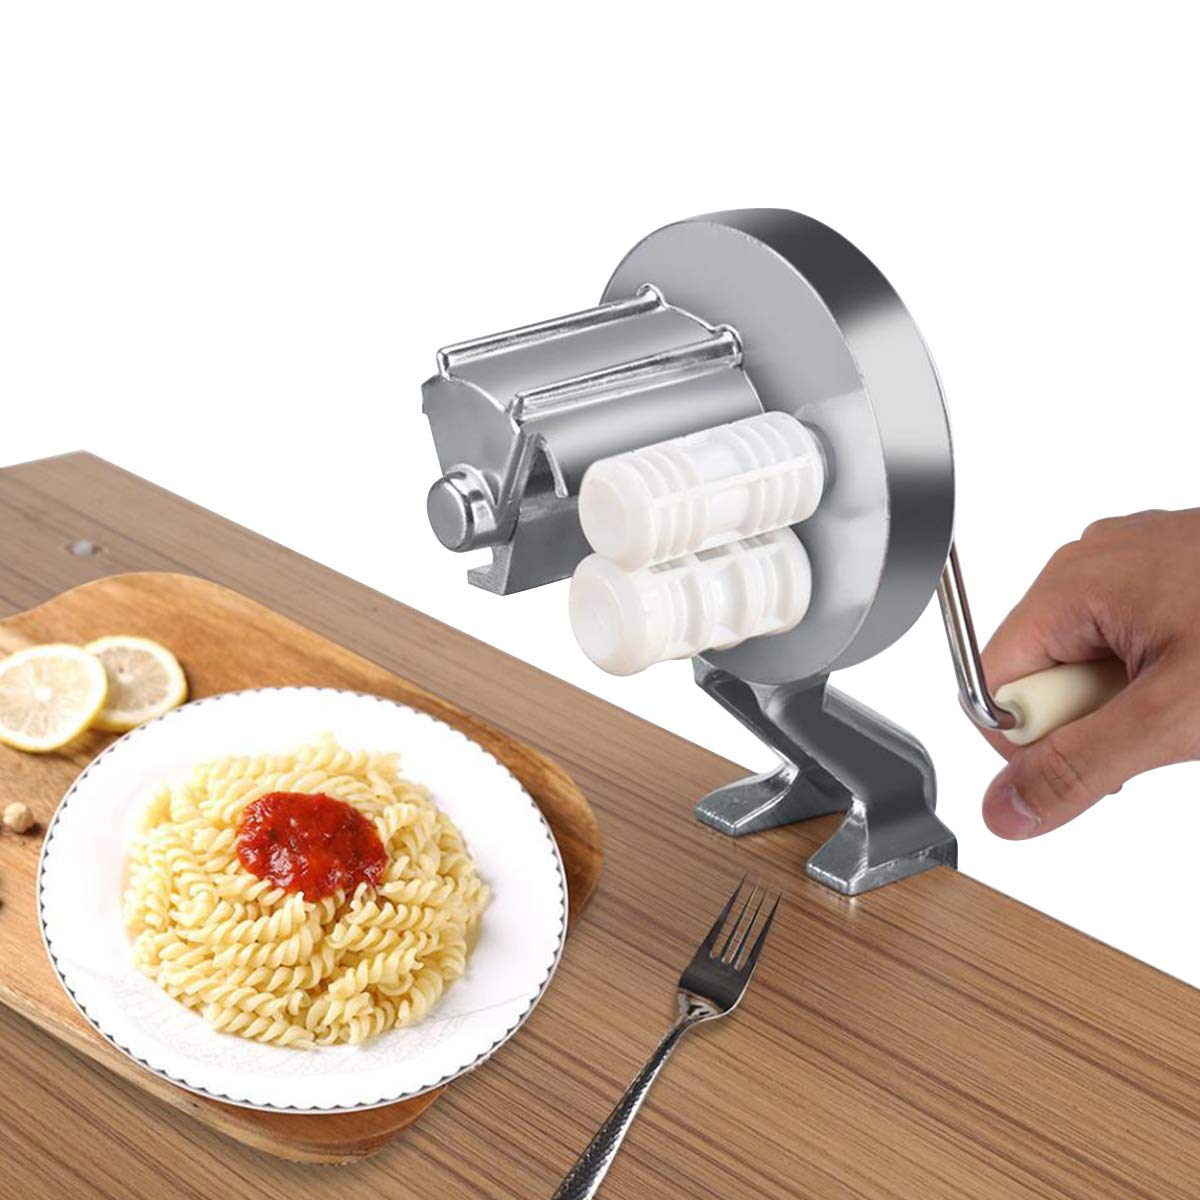 Choppan Manual Pasta Seashells Maker Machine Authentic Cavatelli Metal in Kitchen, White by Choppan